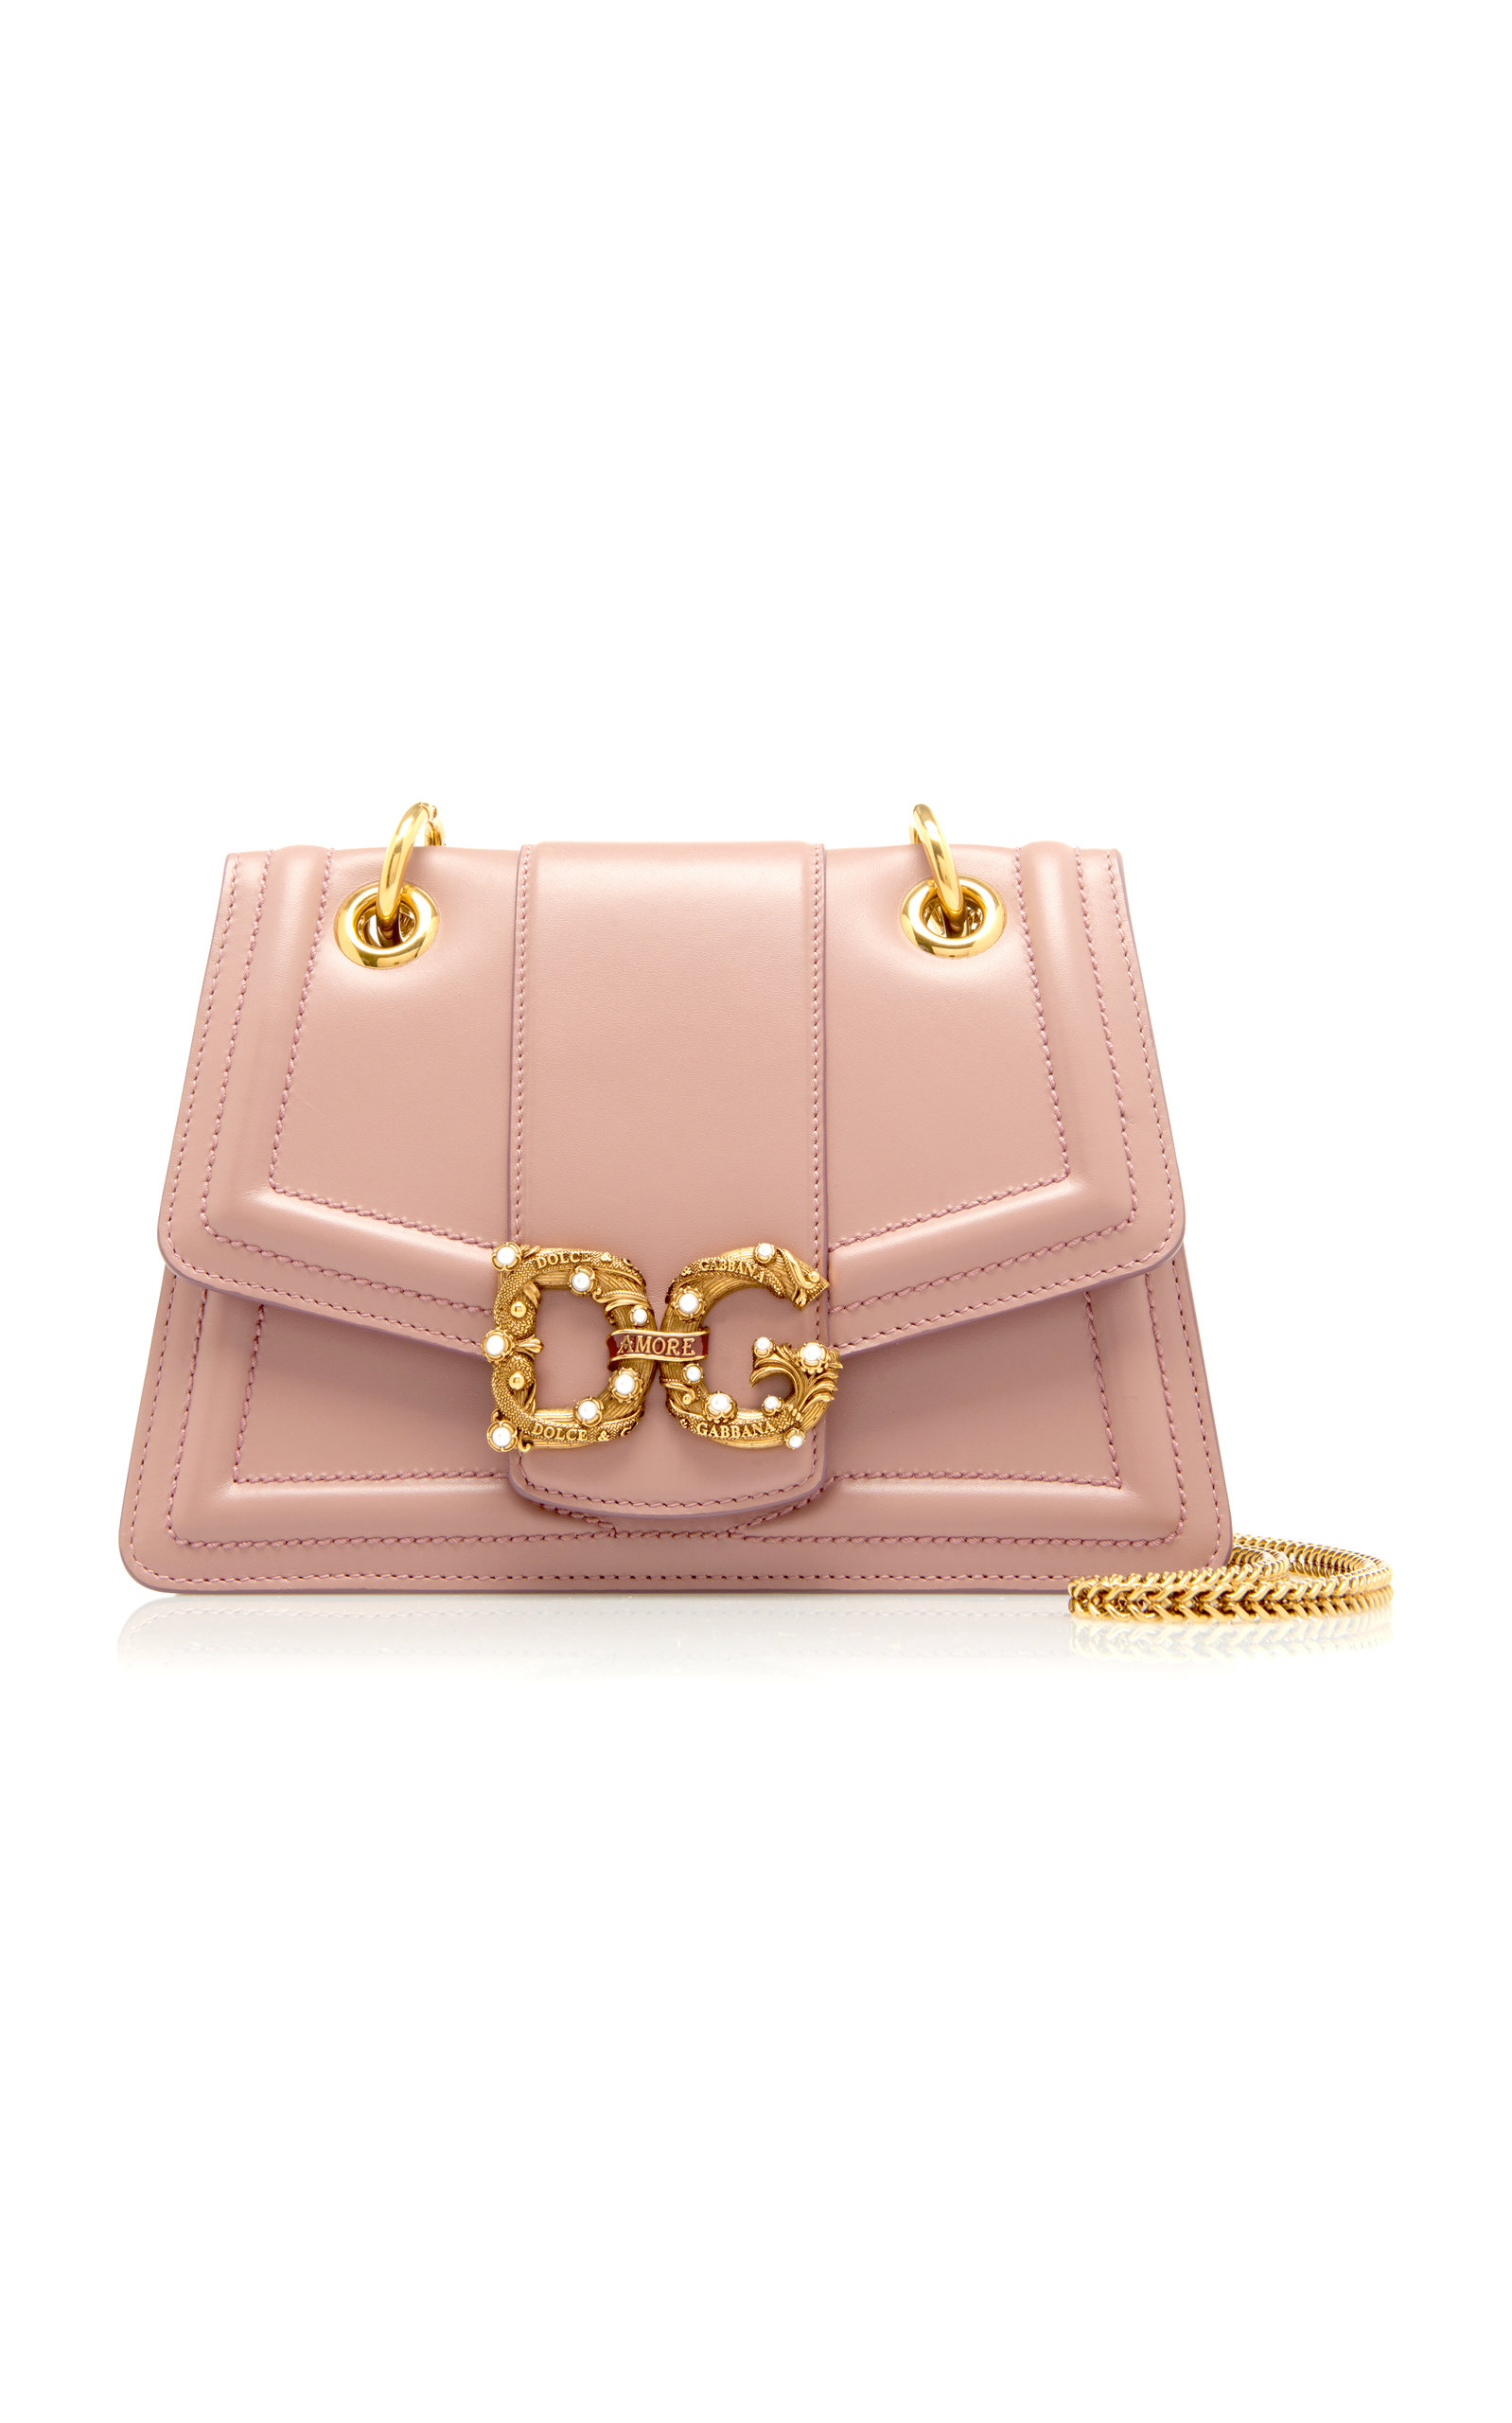 Amore Small Leather Shoulder Bag